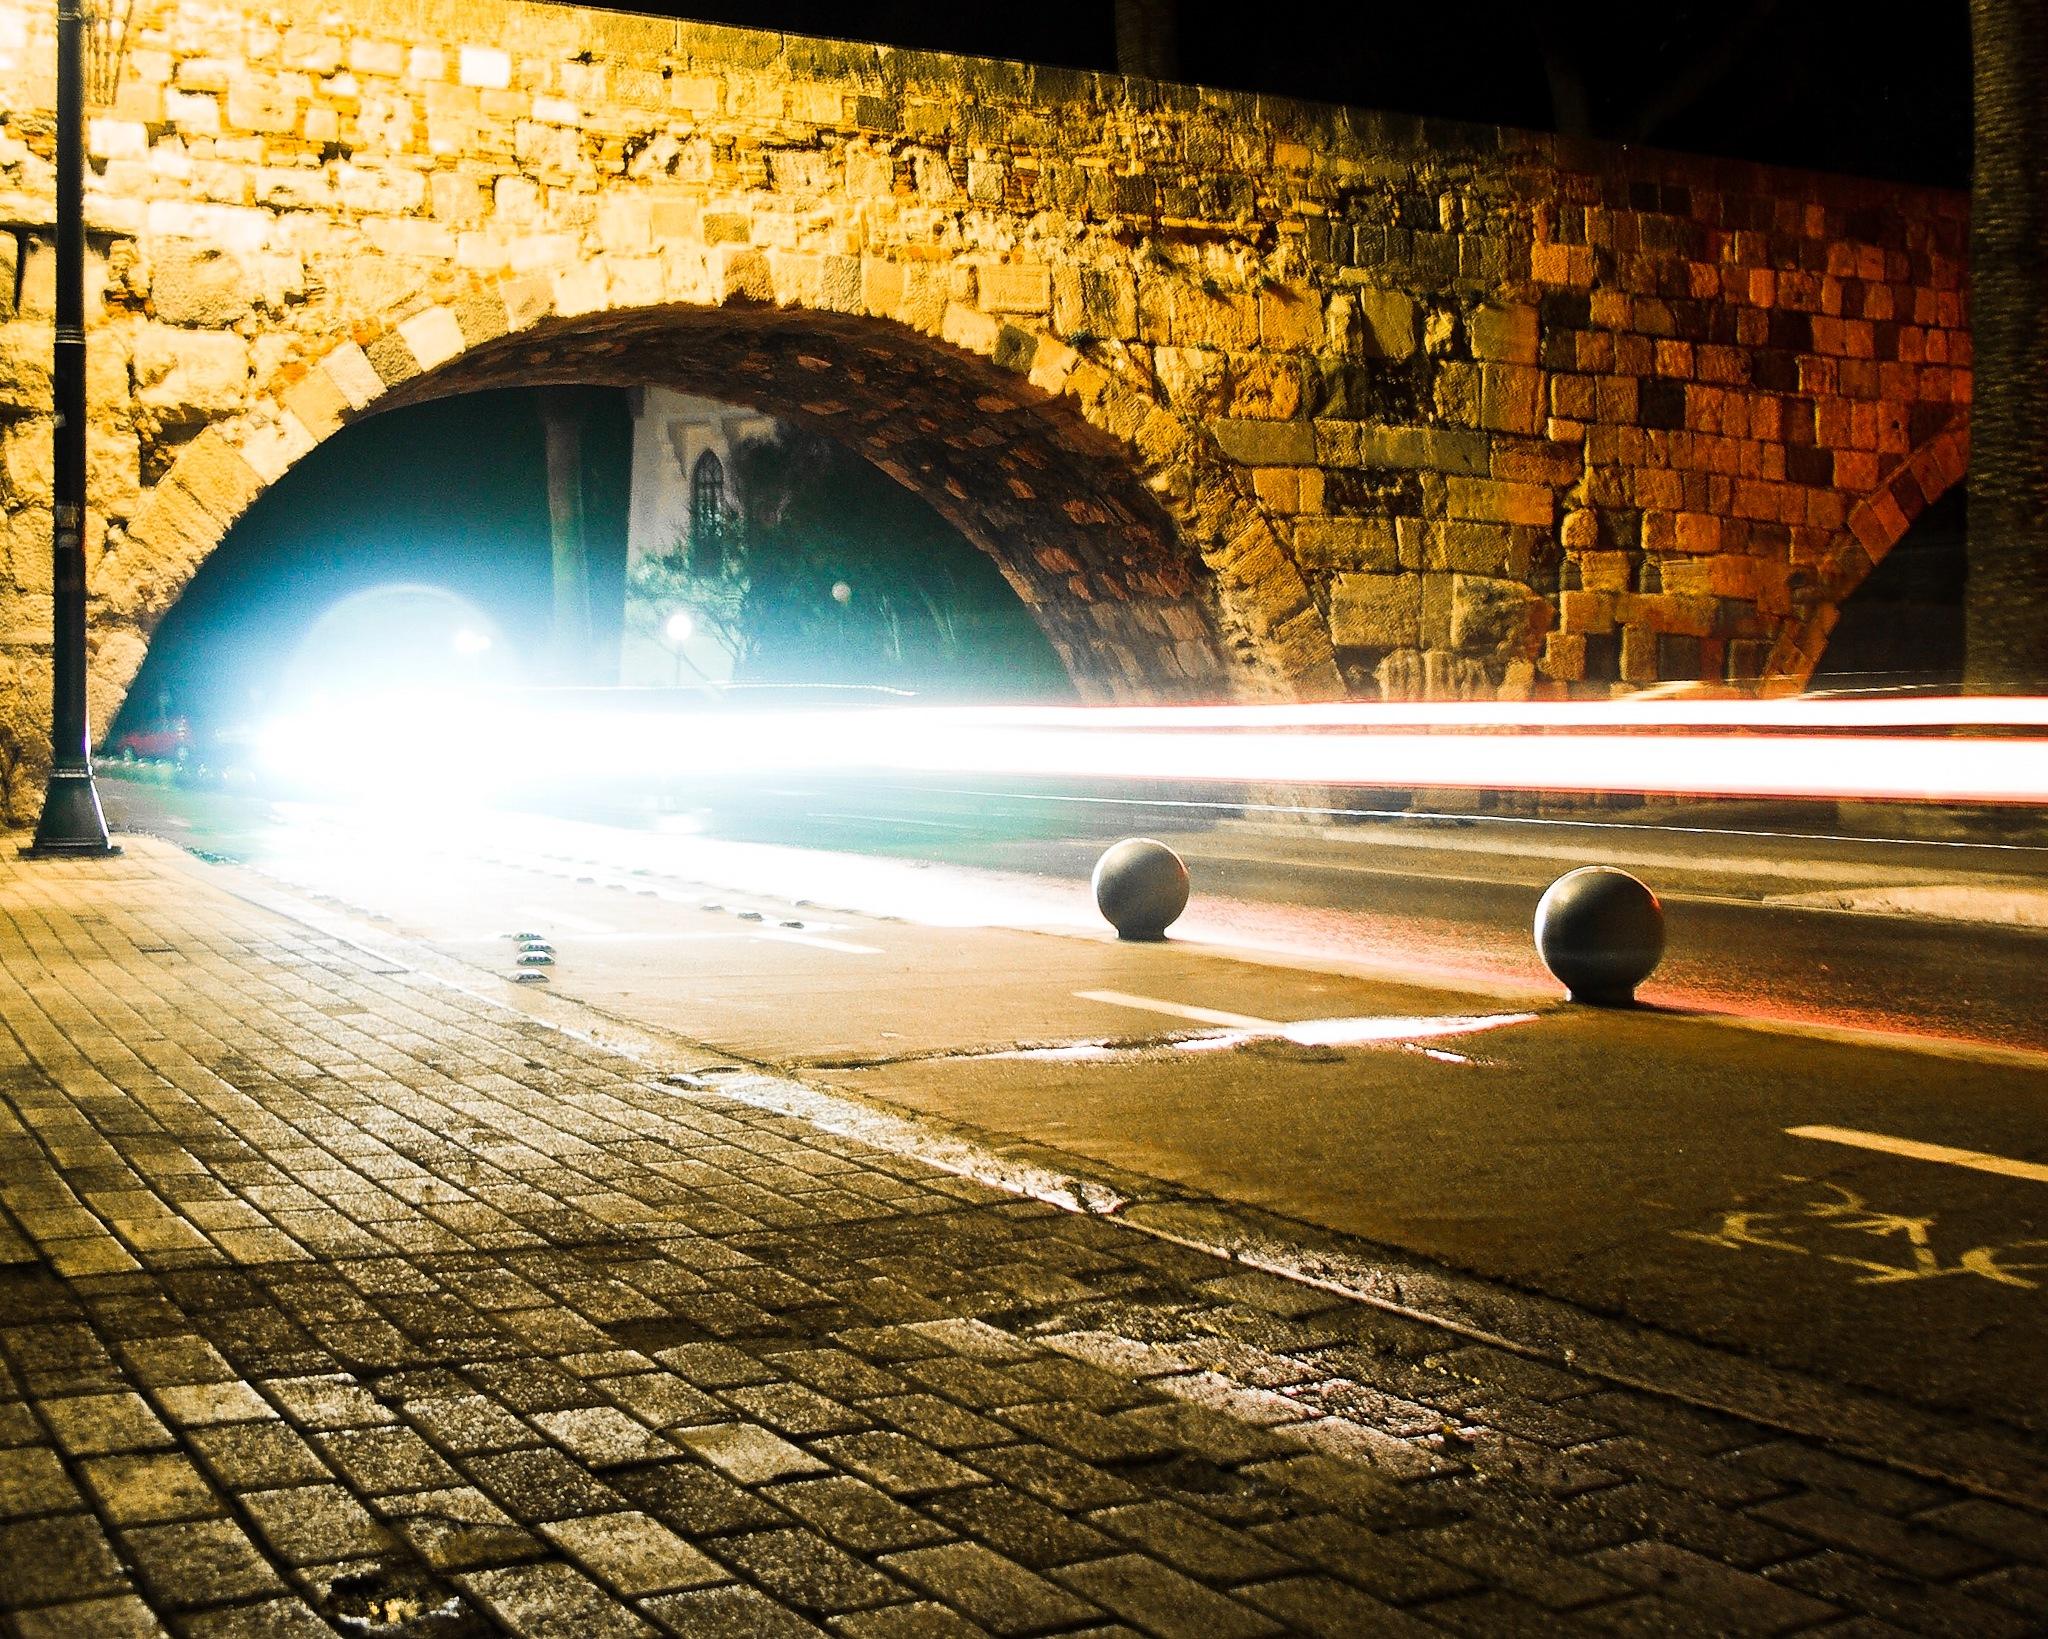 Light trails vol.2 by Patroklos Papalexis